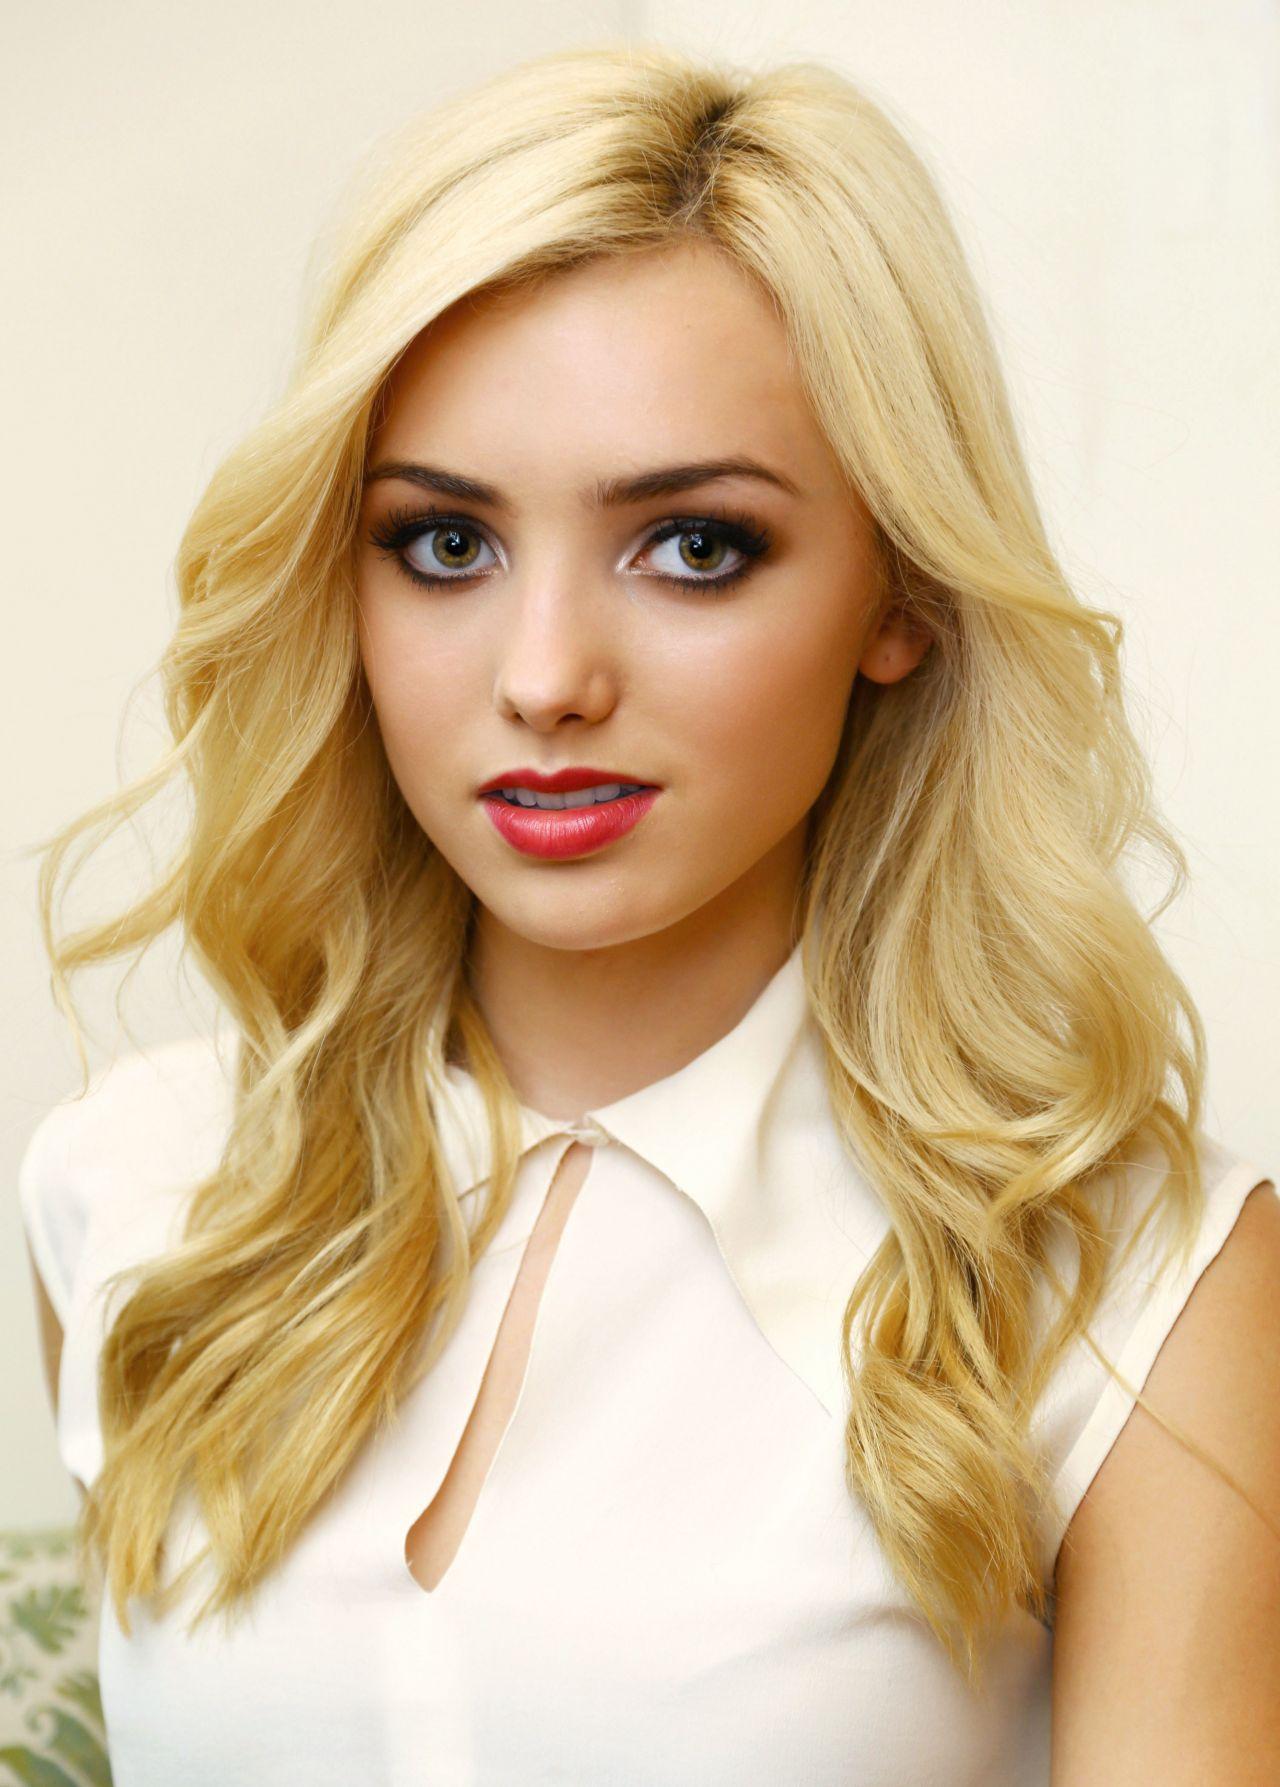 Actress Peyton List - age: 19